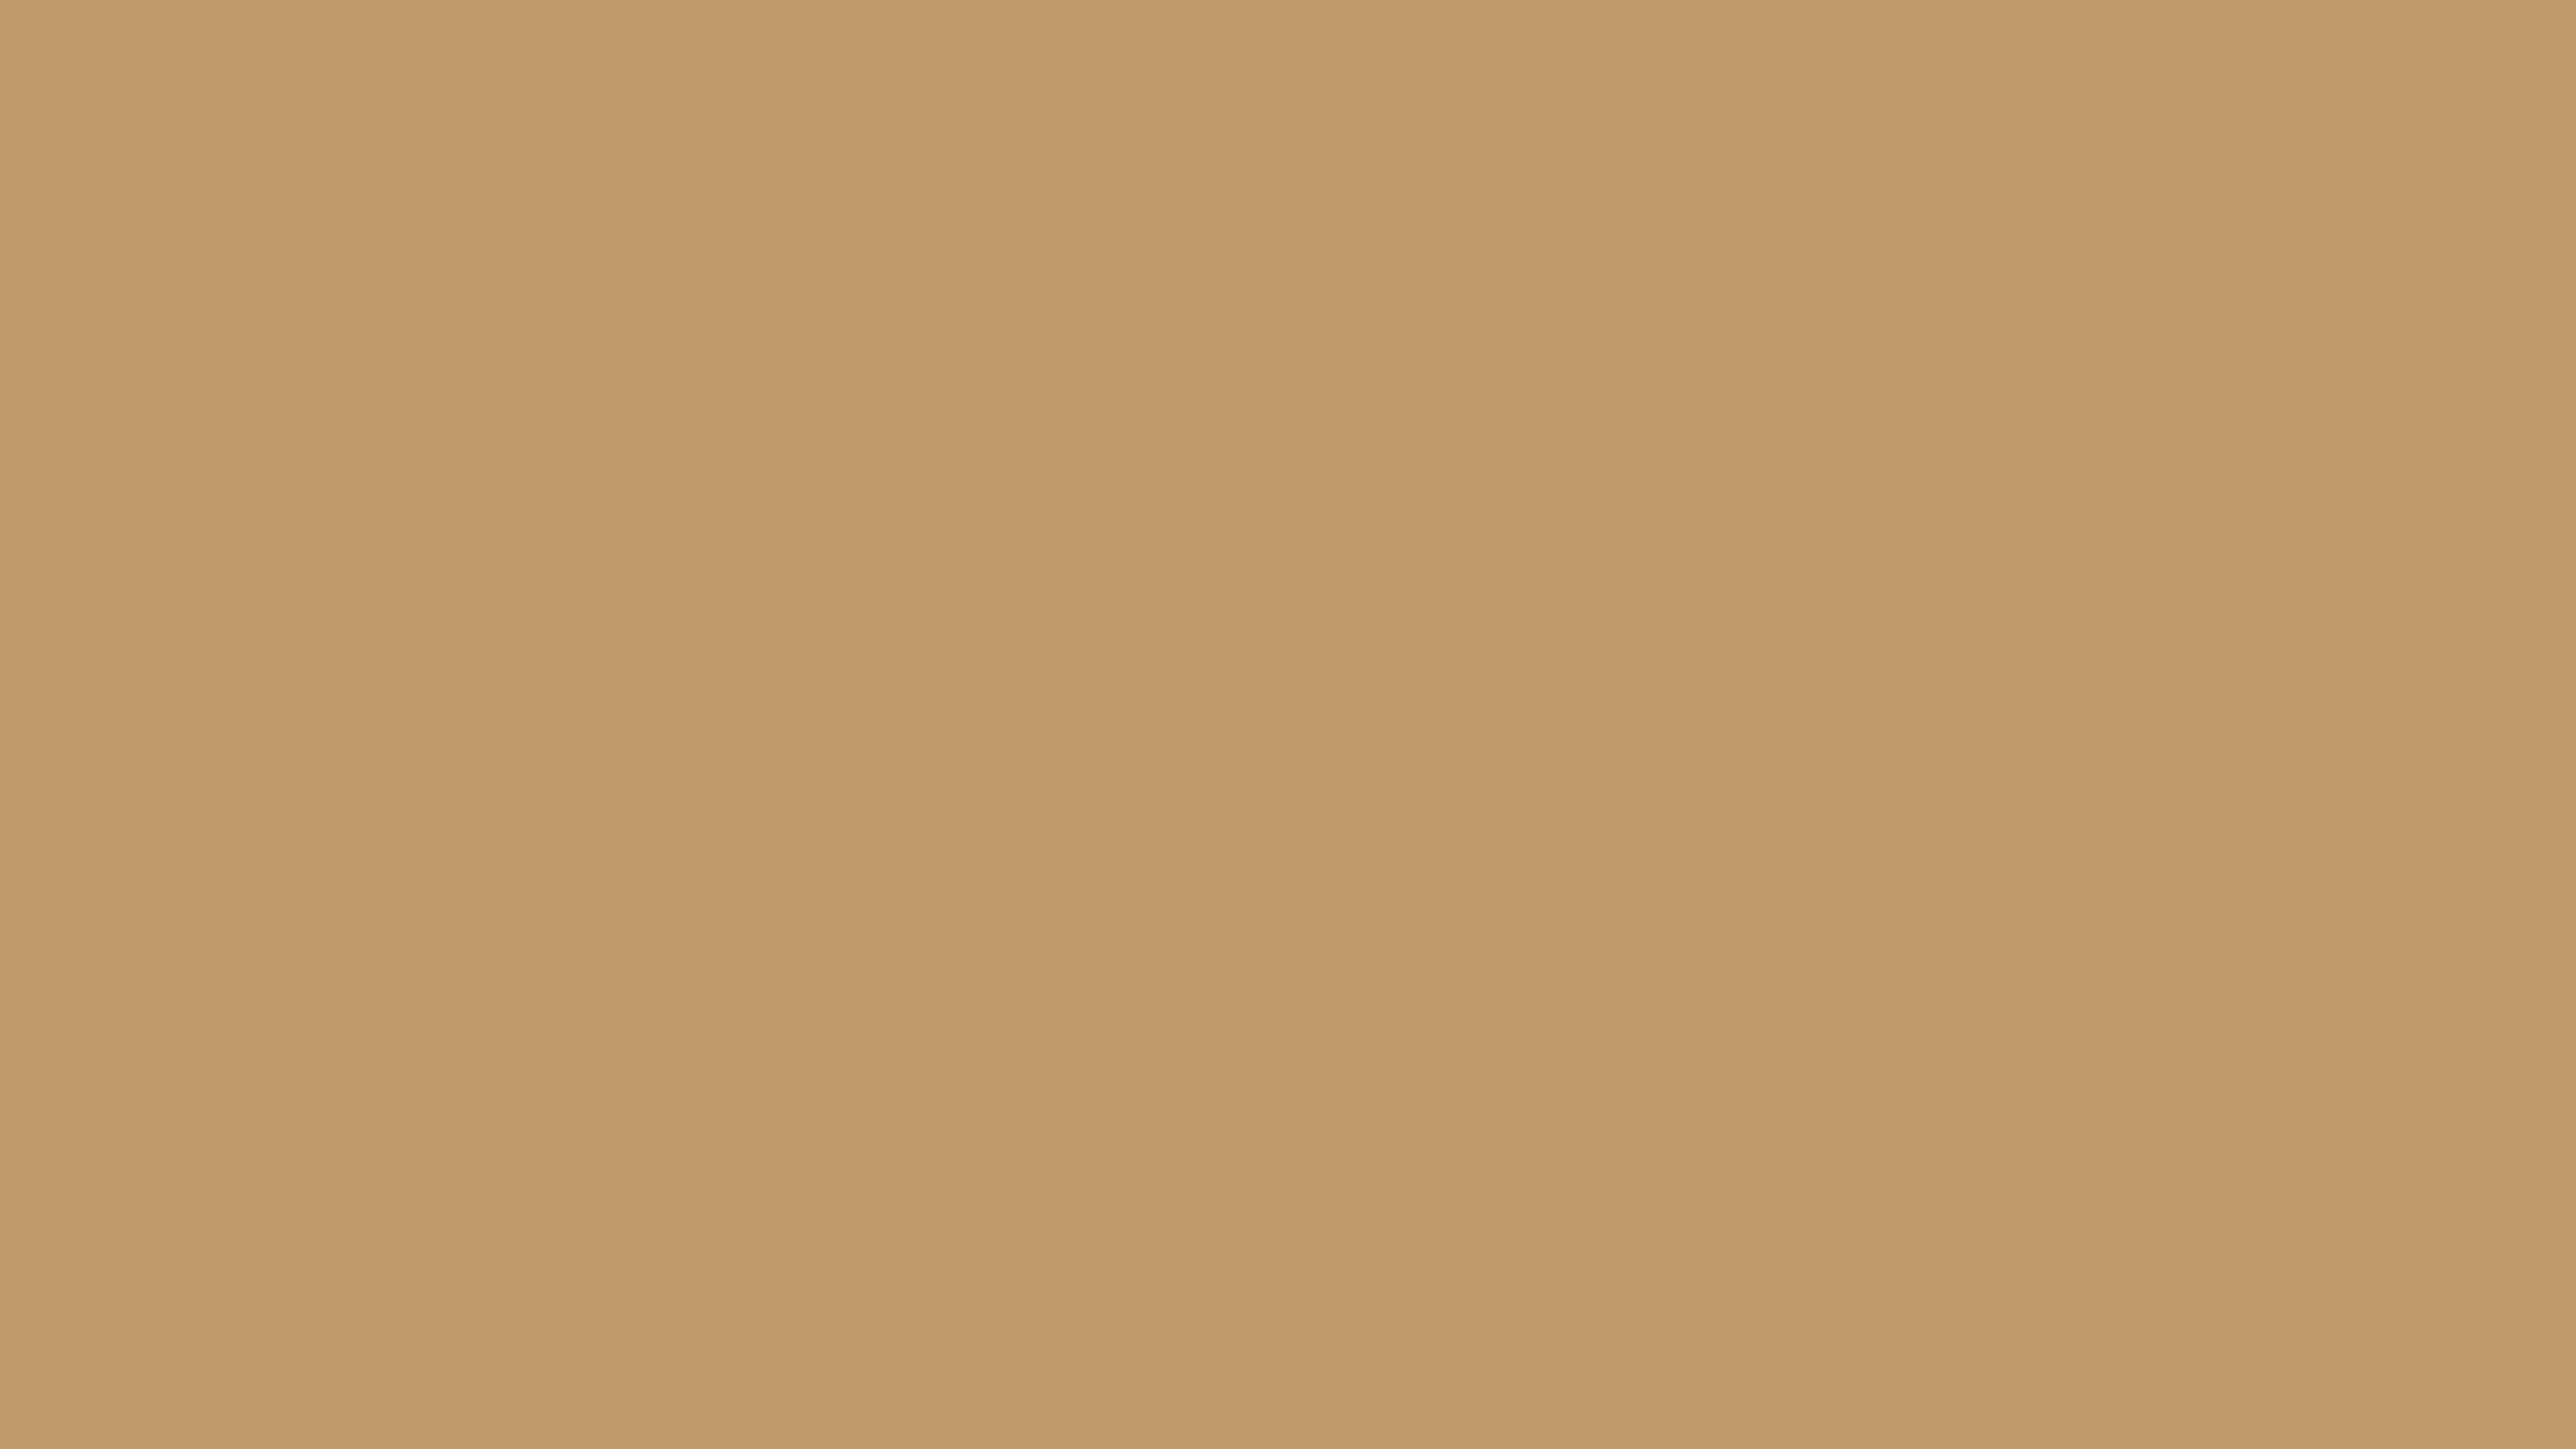 3840x2160 Lion Solid Color Background